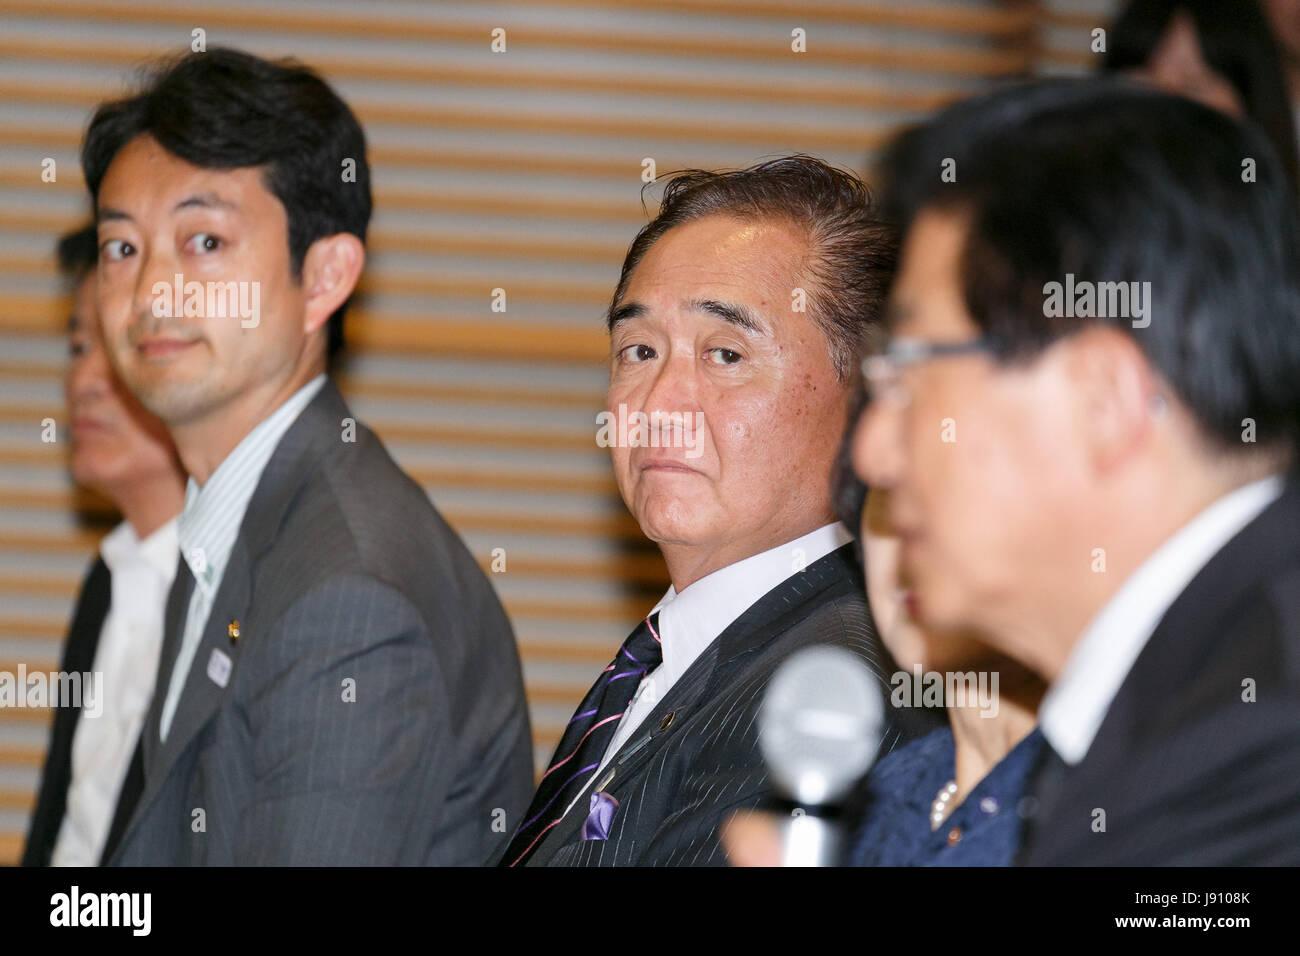 Toshihito Kumagai mayor of the city of Chiba (L) sits alongside Governor of Kanagawa Prefecture Yuji Kuroiwa (C), - Stock Image